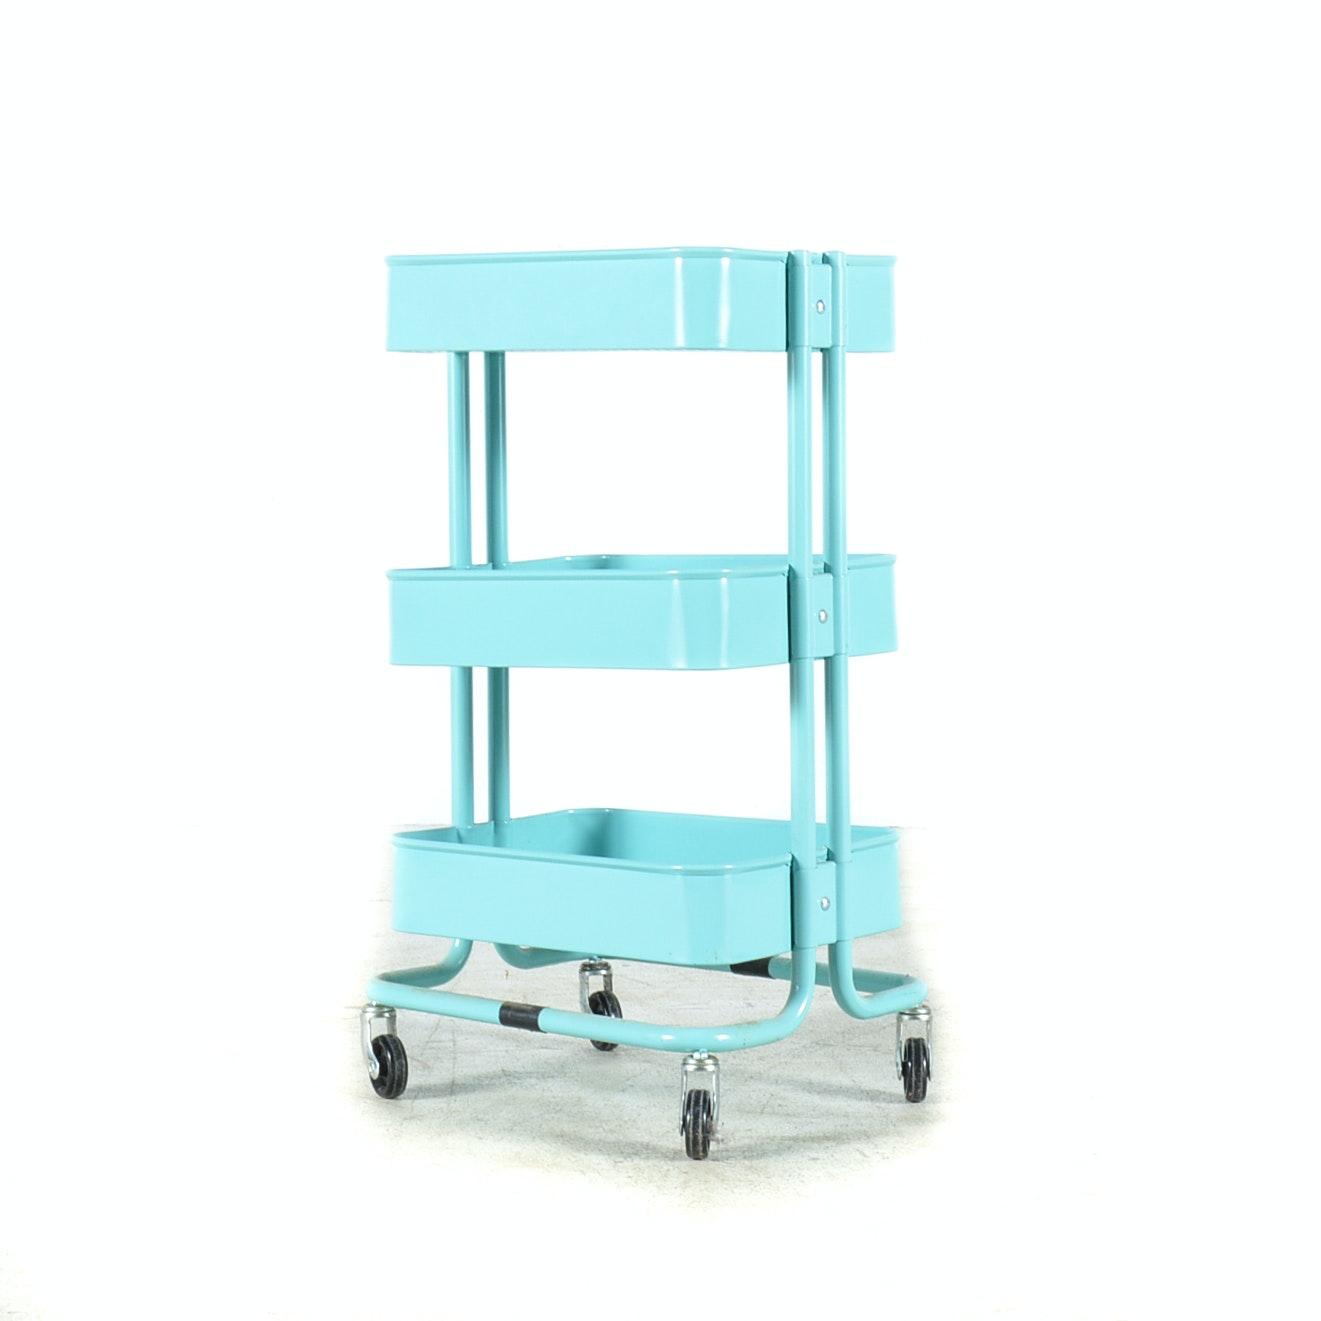 Ikea Metal Rolling Cart - Home & Furniture Design - Kitchenagenda.com